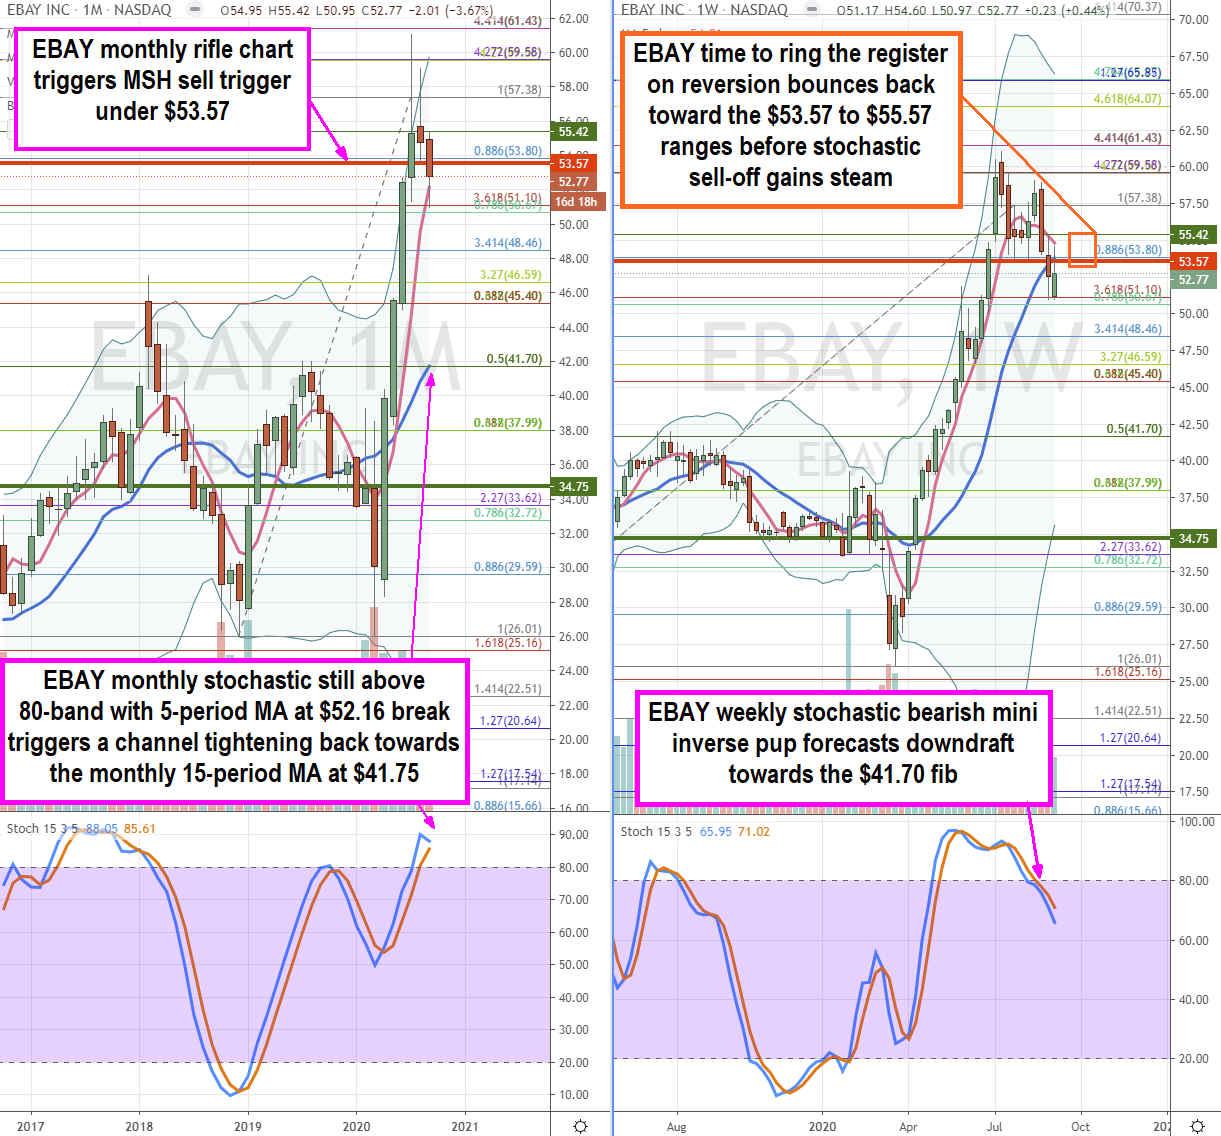 eBay (NASDAQ: EBAY) Stock is Ready for Profit Taking